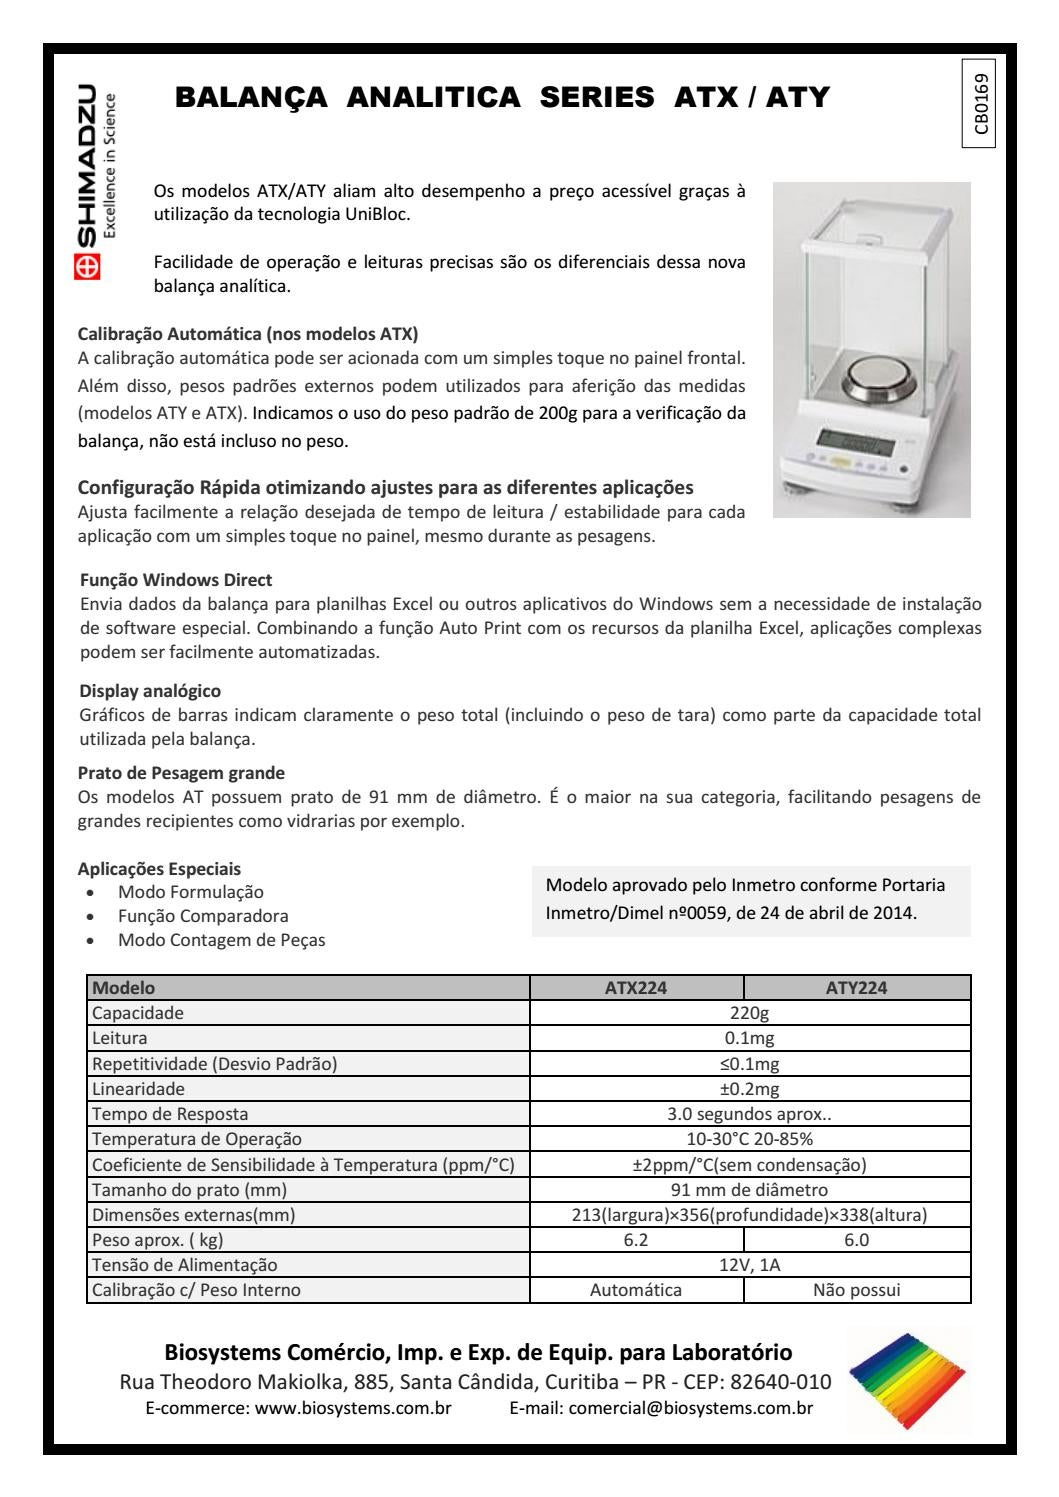 acce06e5b CB0169 - Balança analítica série ATX/ATY - Shimadzu by Biosystems  Importadora Ltda - issuu